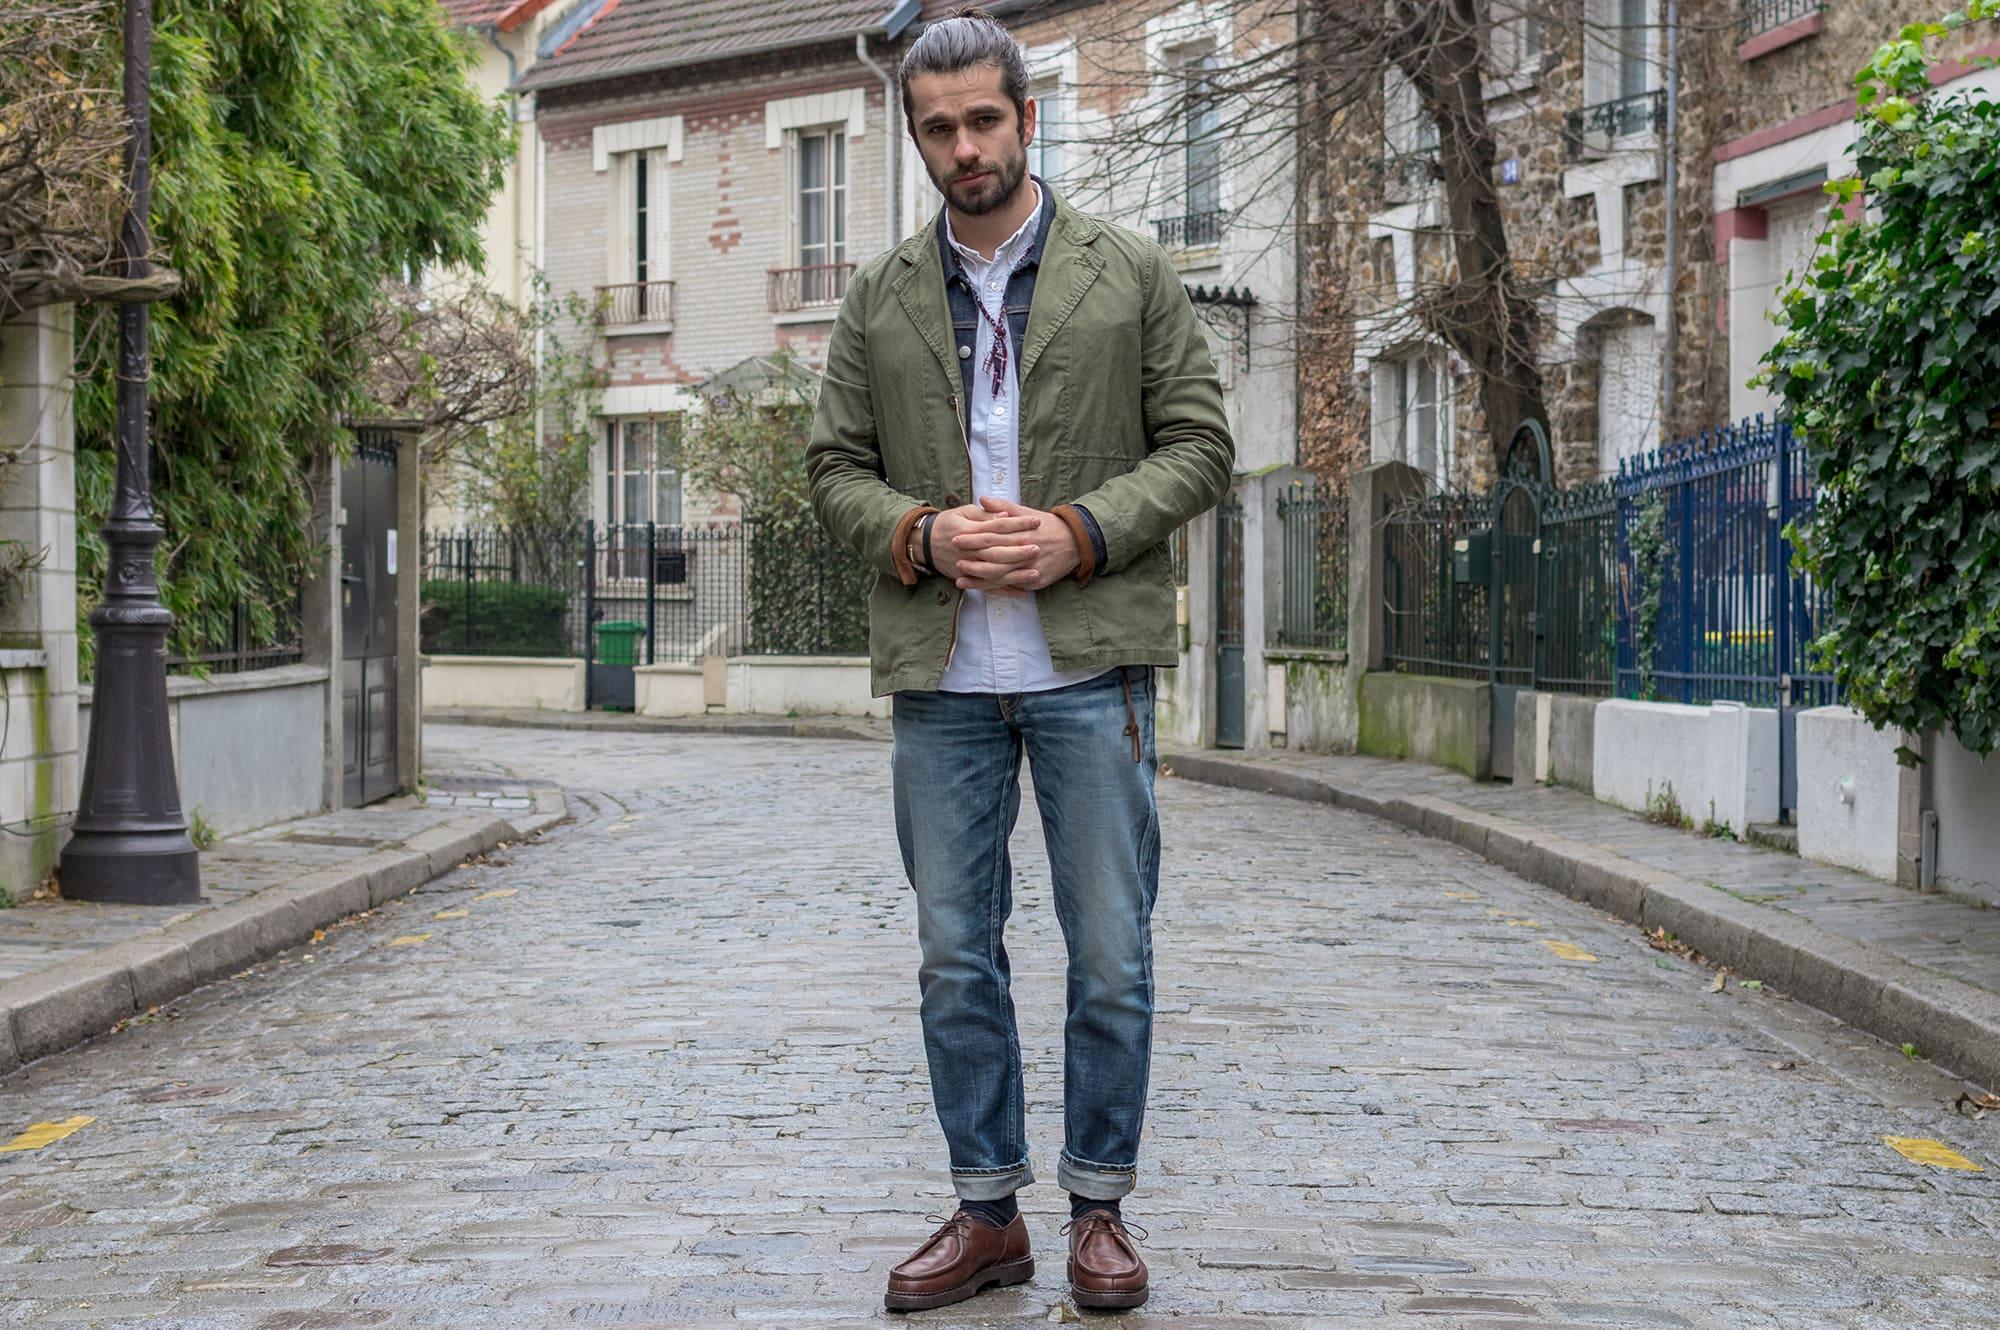 comment porter un jean semi slim dans un style workwear street heritage